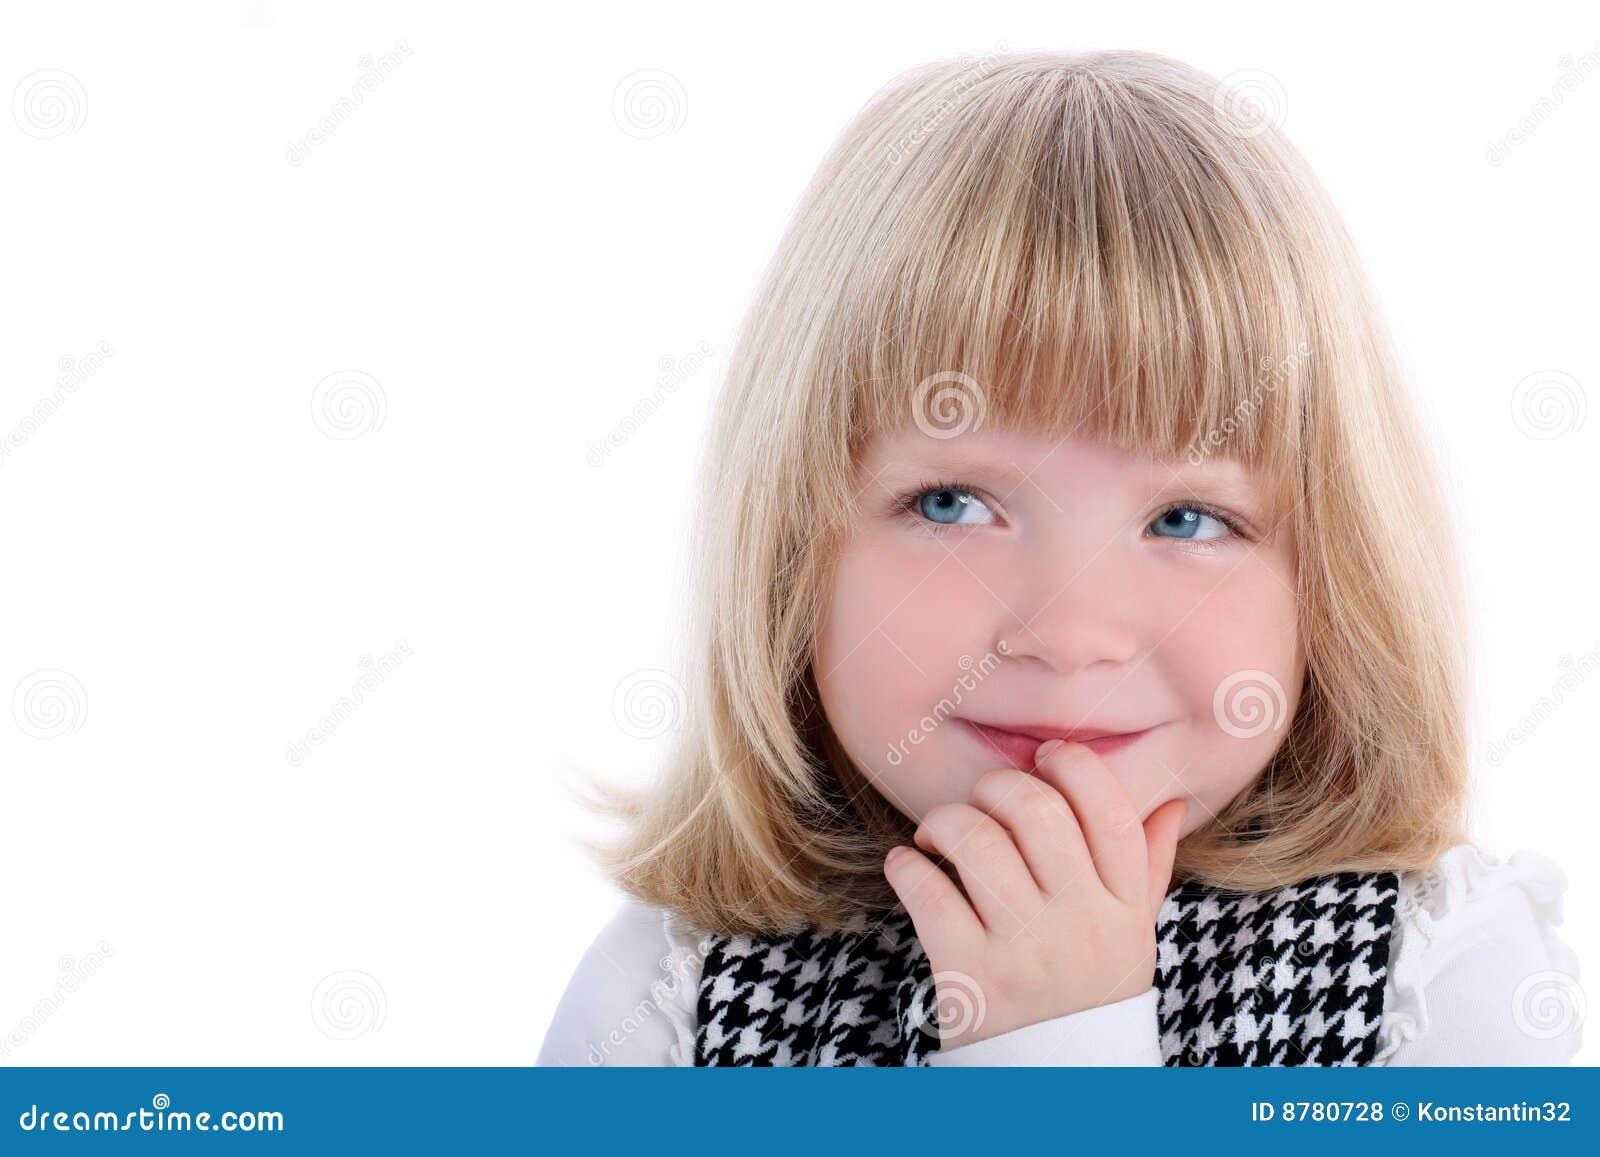 Cute toddler girl haircuts